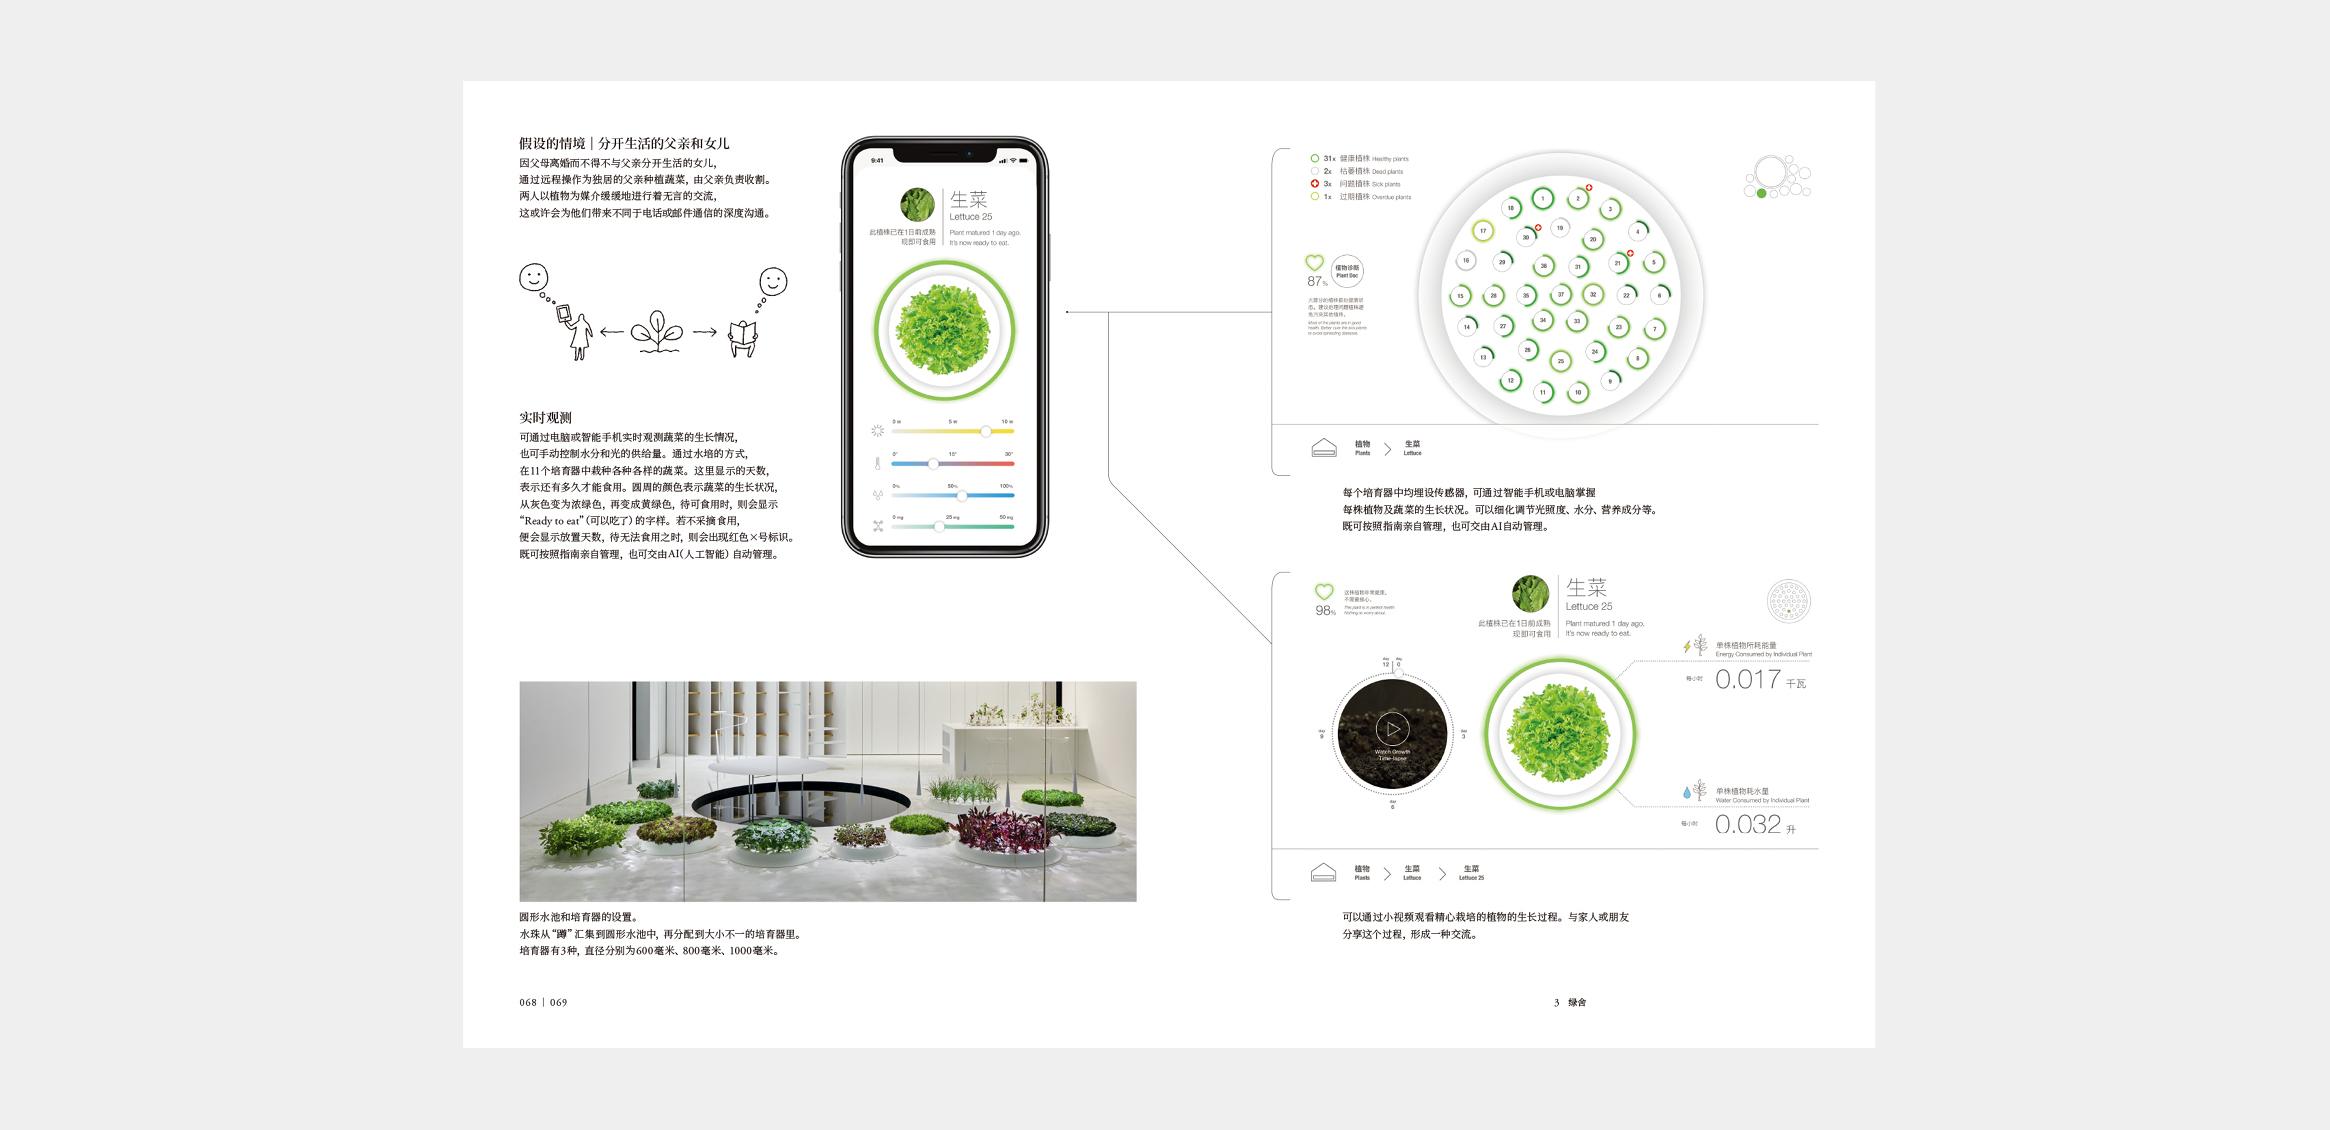 HOUSE VISION 2018 BEIJING EXHIBITION展覧会書籍7枚目